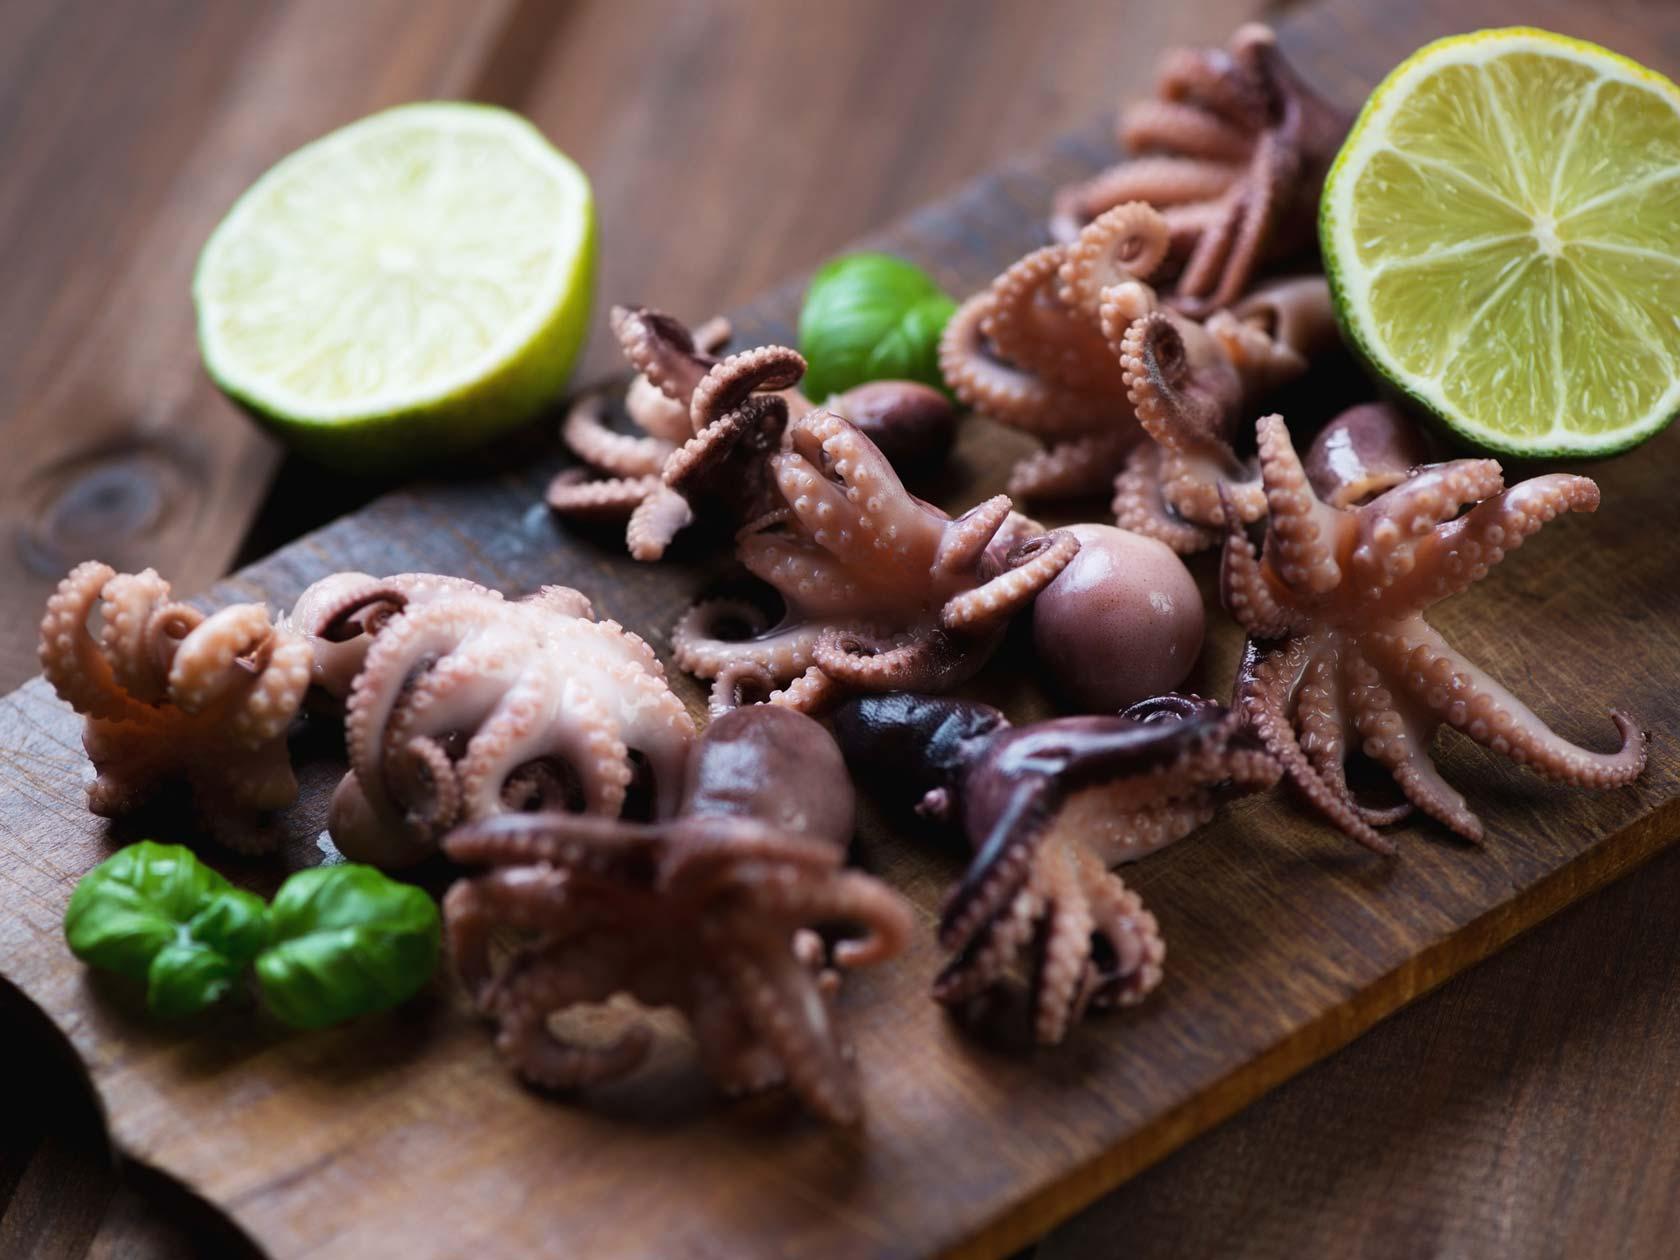 Buy Baby Octopus Online Whole Frozen Asian Octopus The